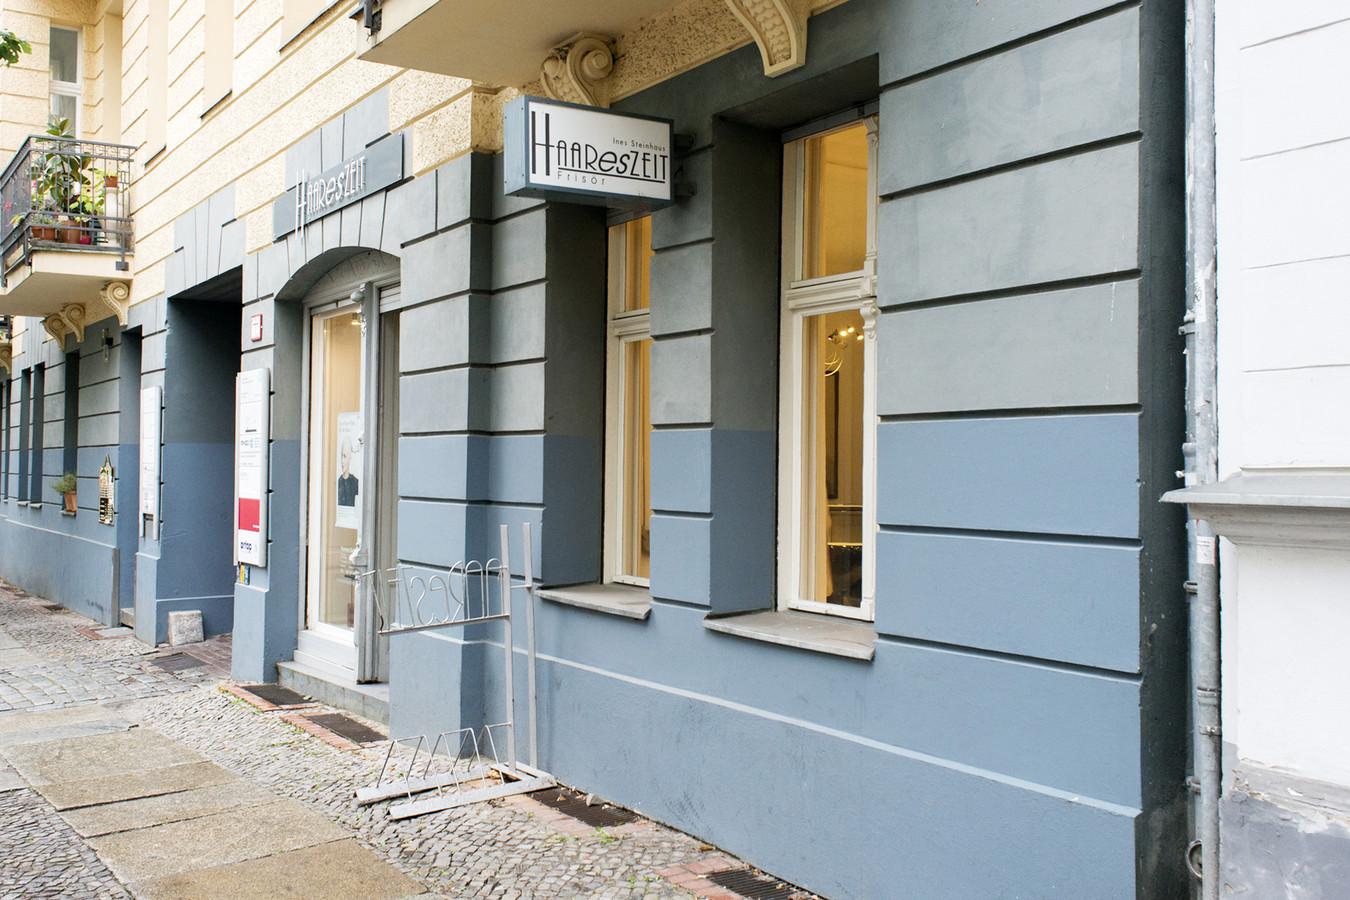 Fine U0026 Dandy,Alle Top10 Locations Aus Friseur Top10berlin,Schnittweise Hair Salons ...